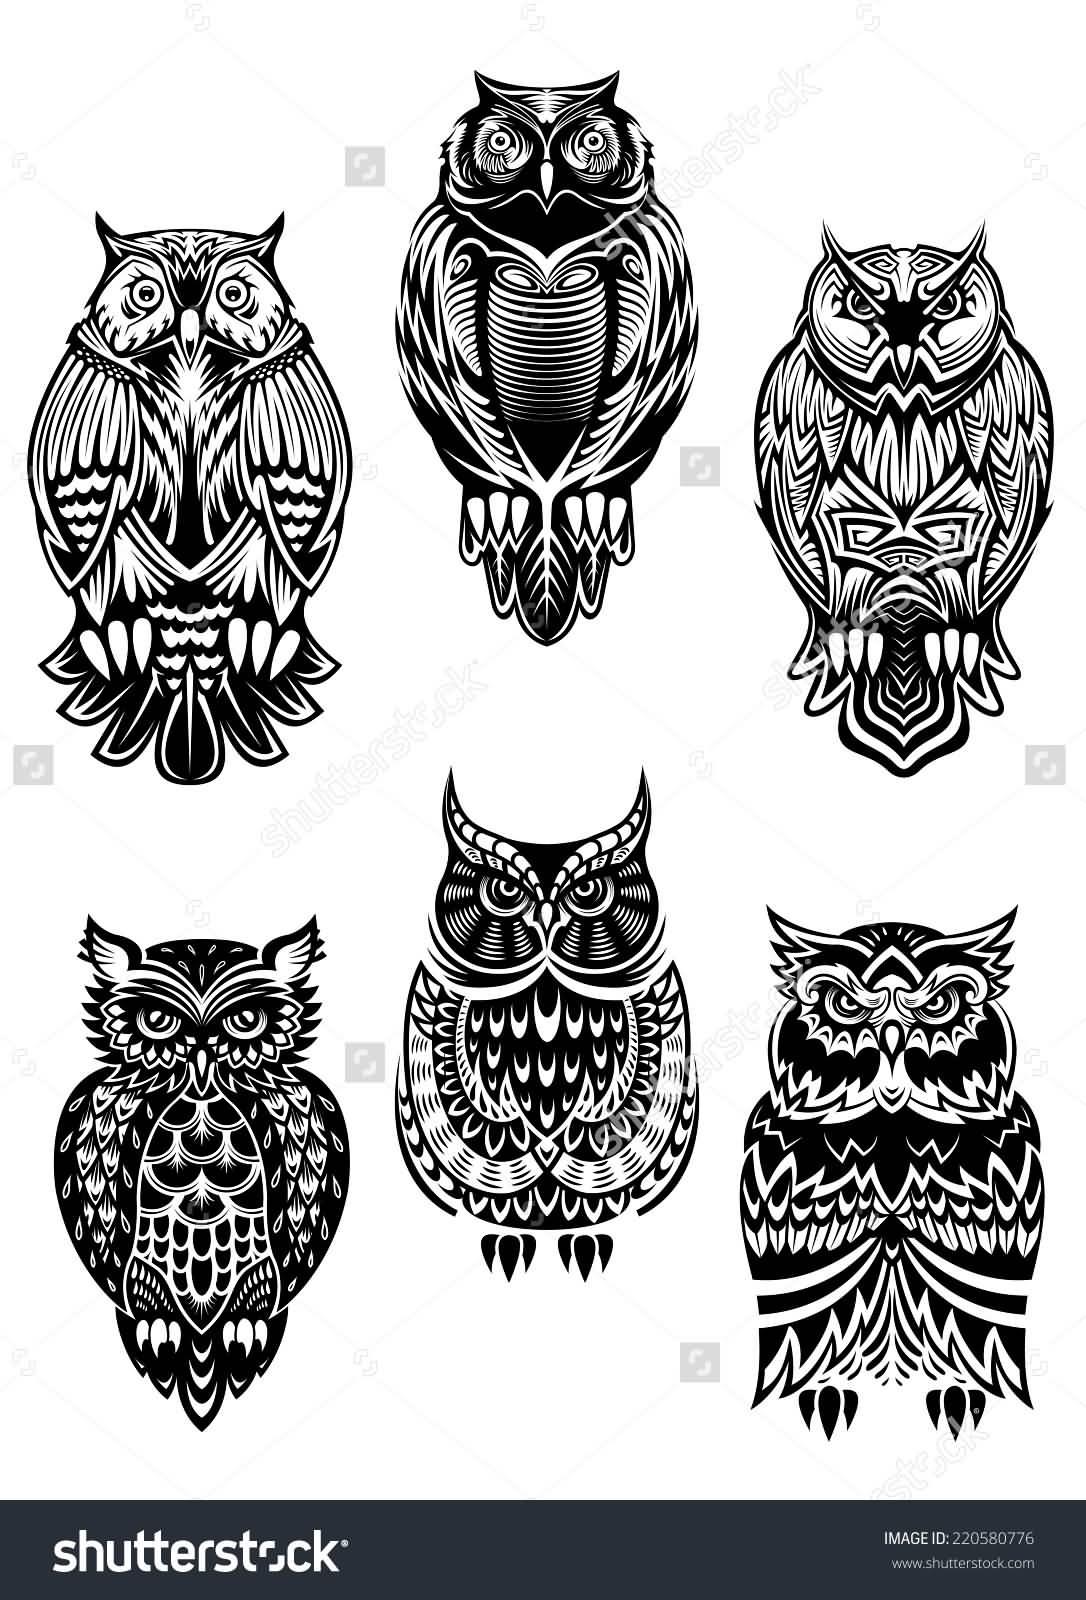 30 Tribal Owl Tattoos Ideas